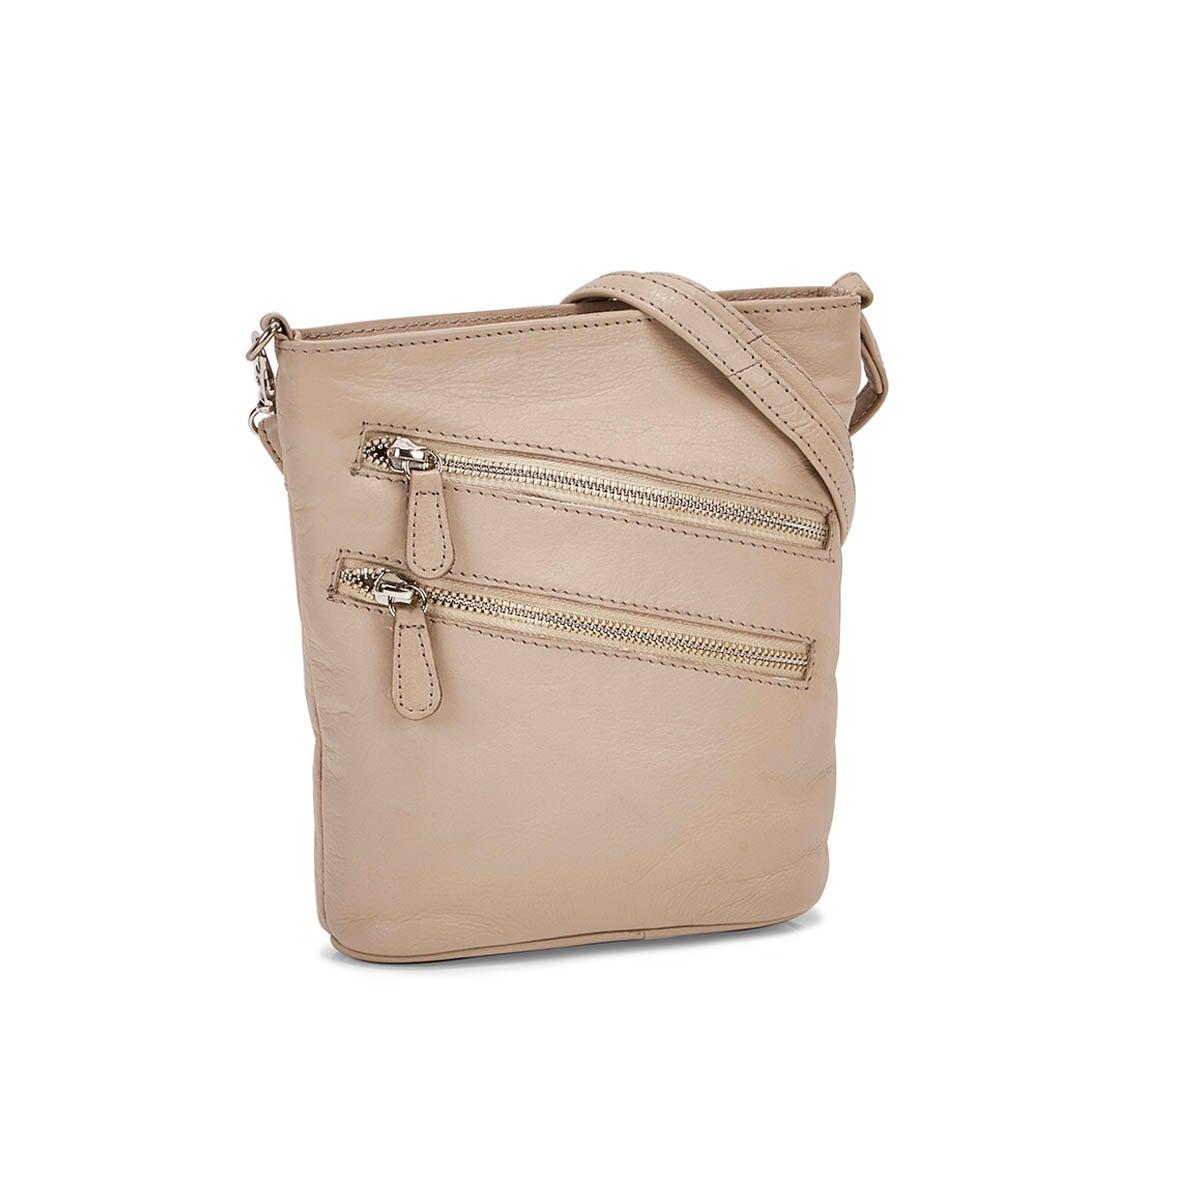 Lds Cassie stone crossbody bag